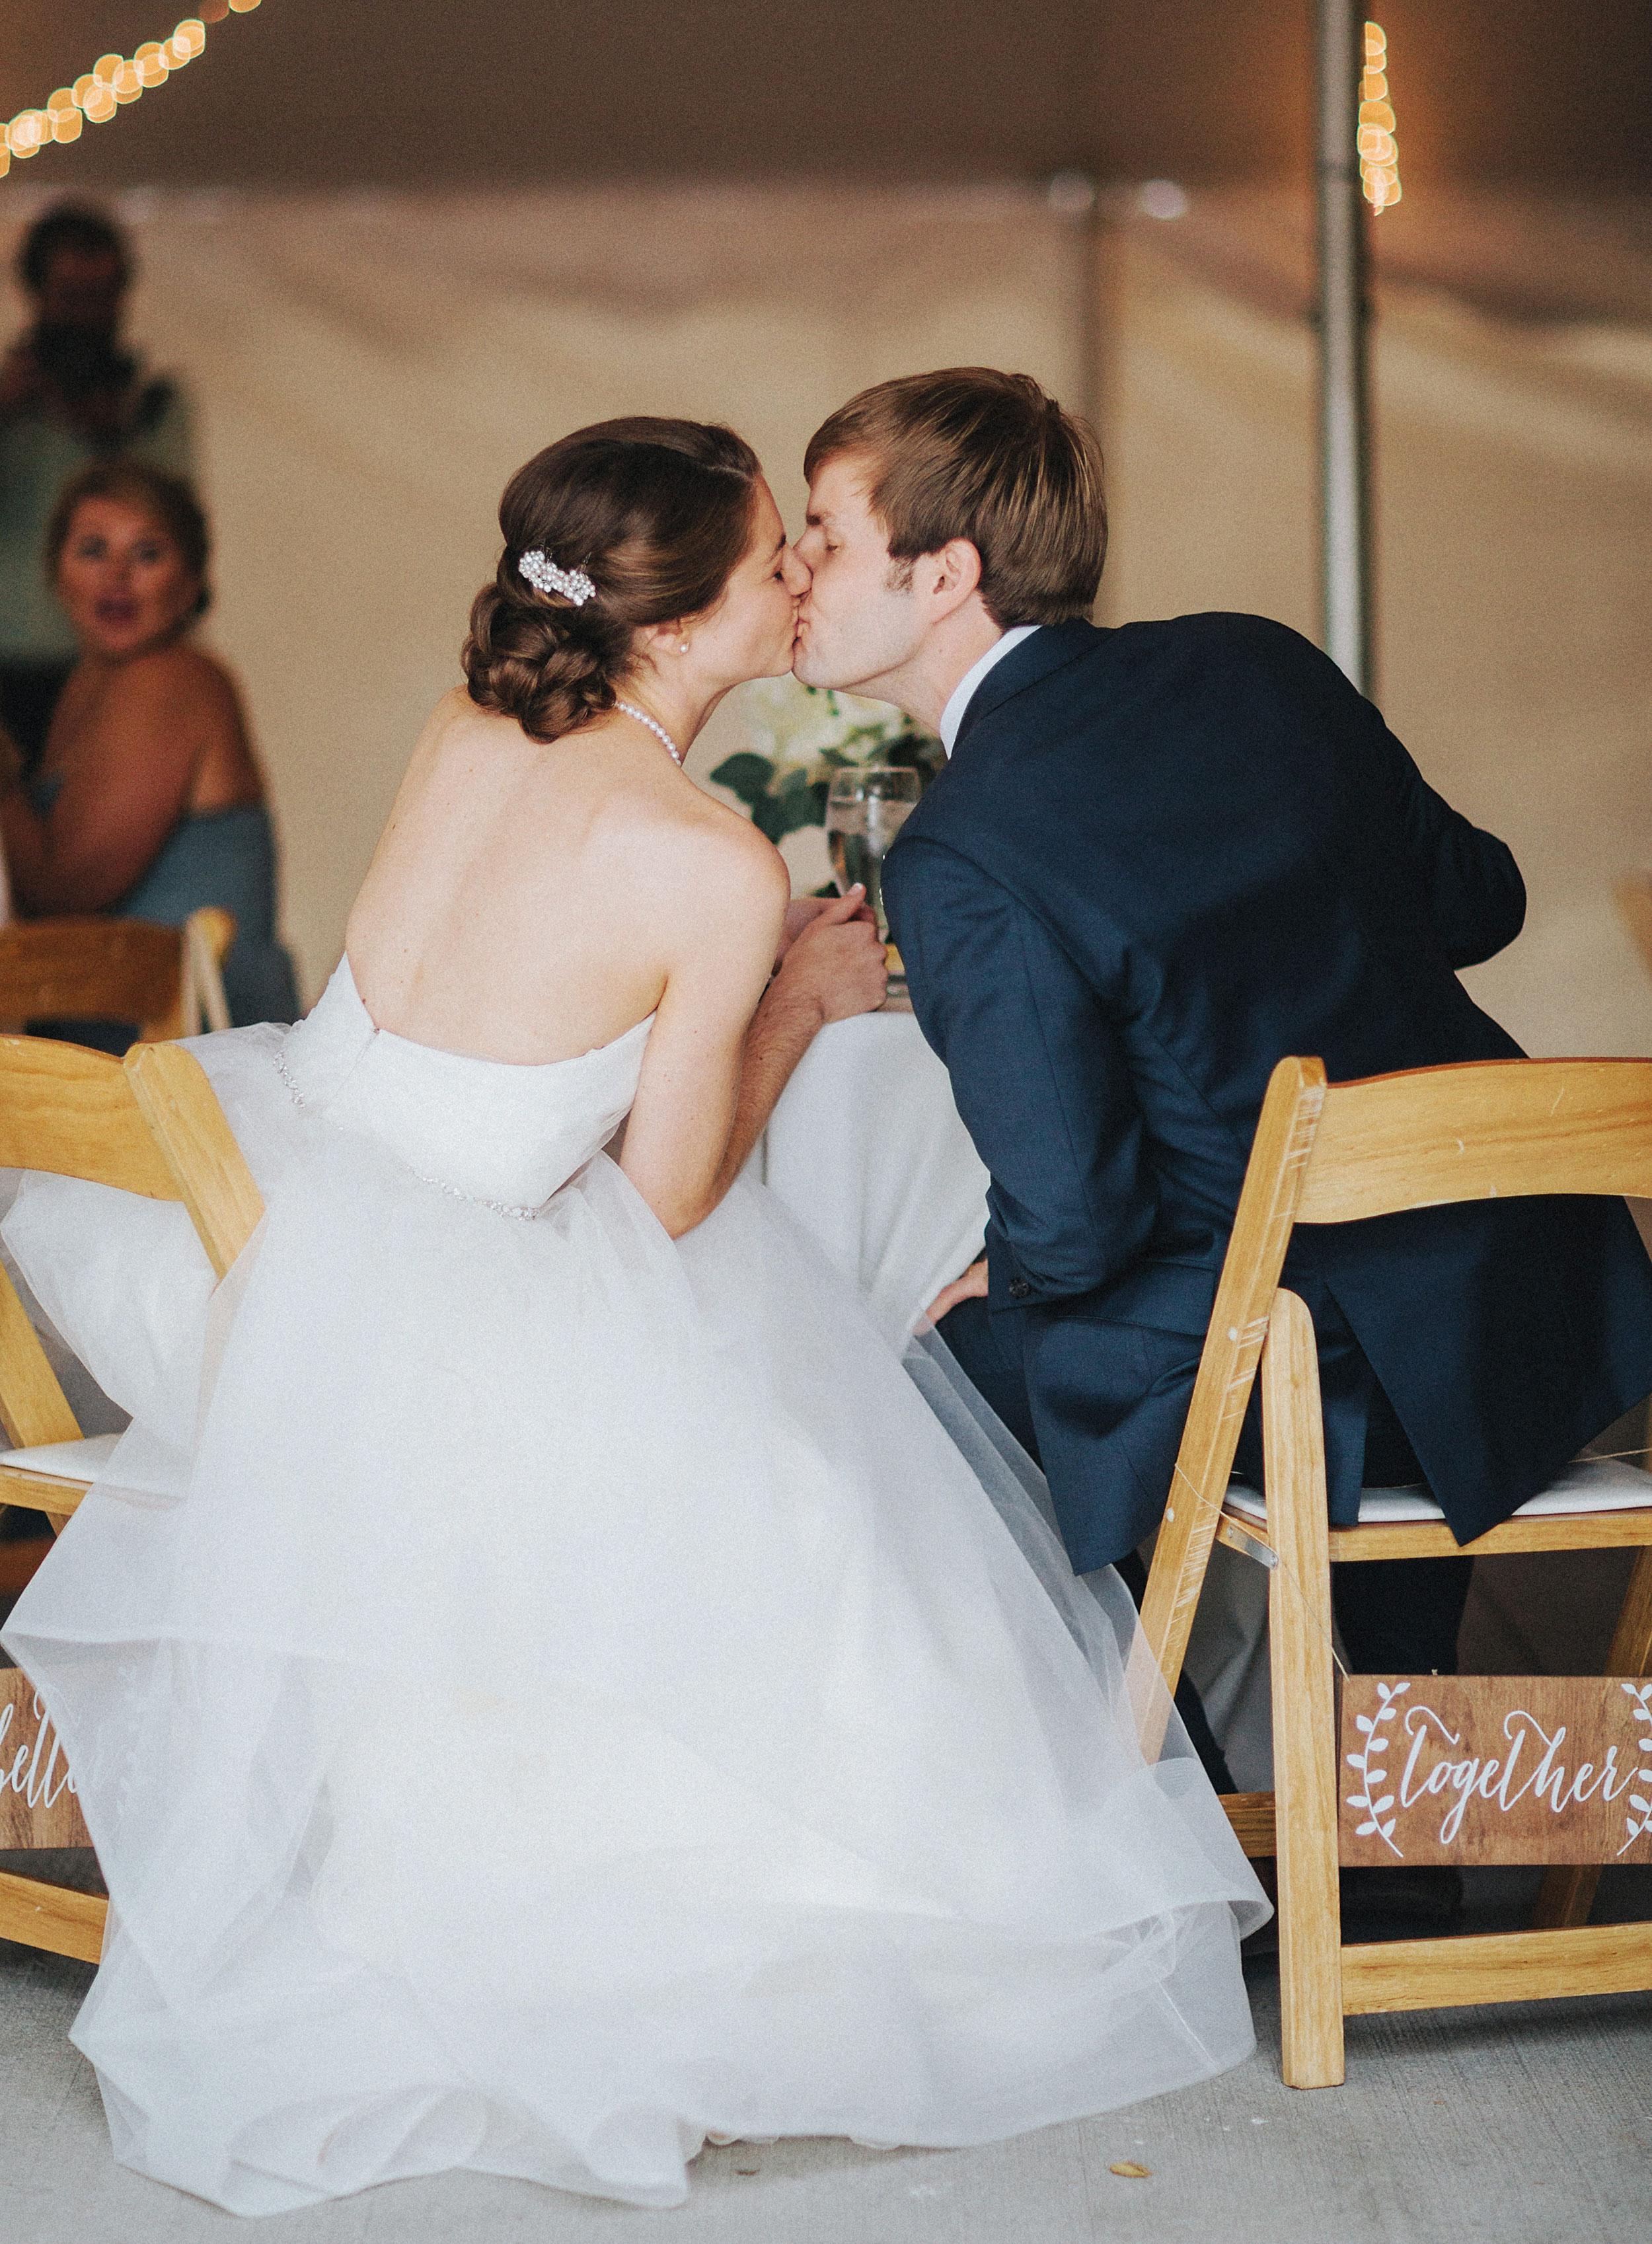 saxony-farm-wedding-photographer-23.JPG